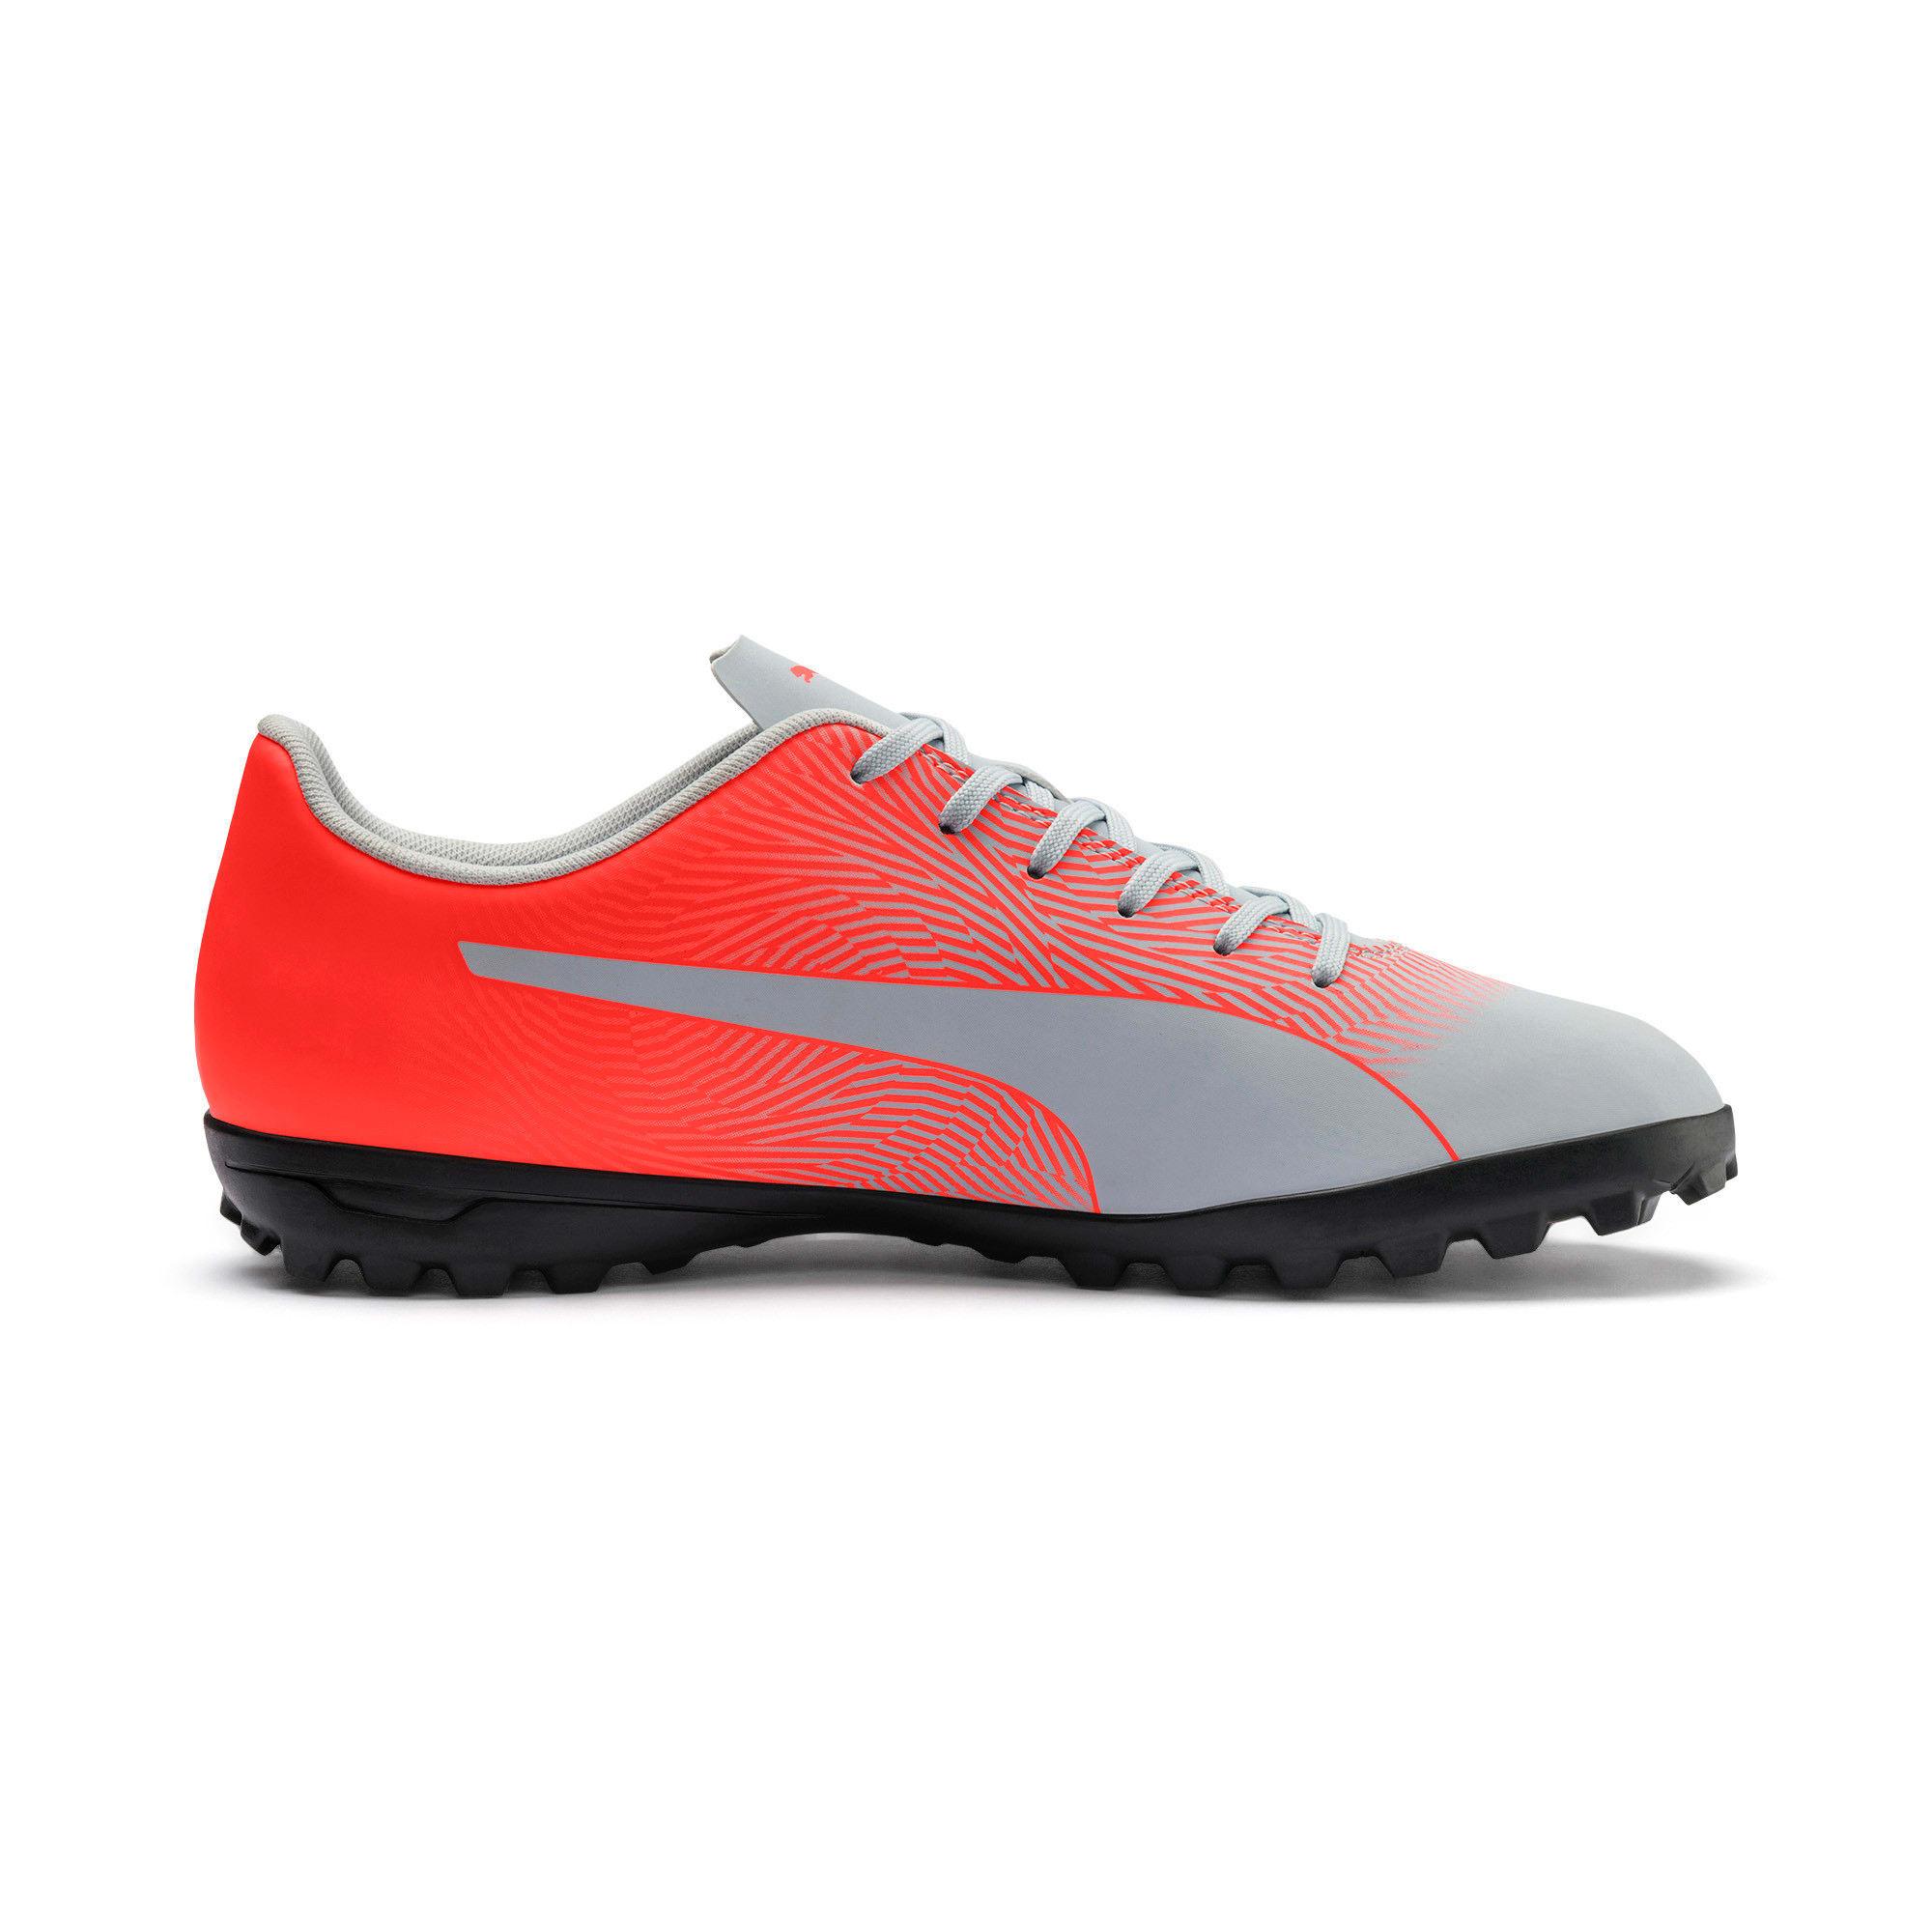 Thumbnail 6 of PUMA Spirit II TT Men's Soccer Shoes, Glacial Blue-Nrgy Red, medium